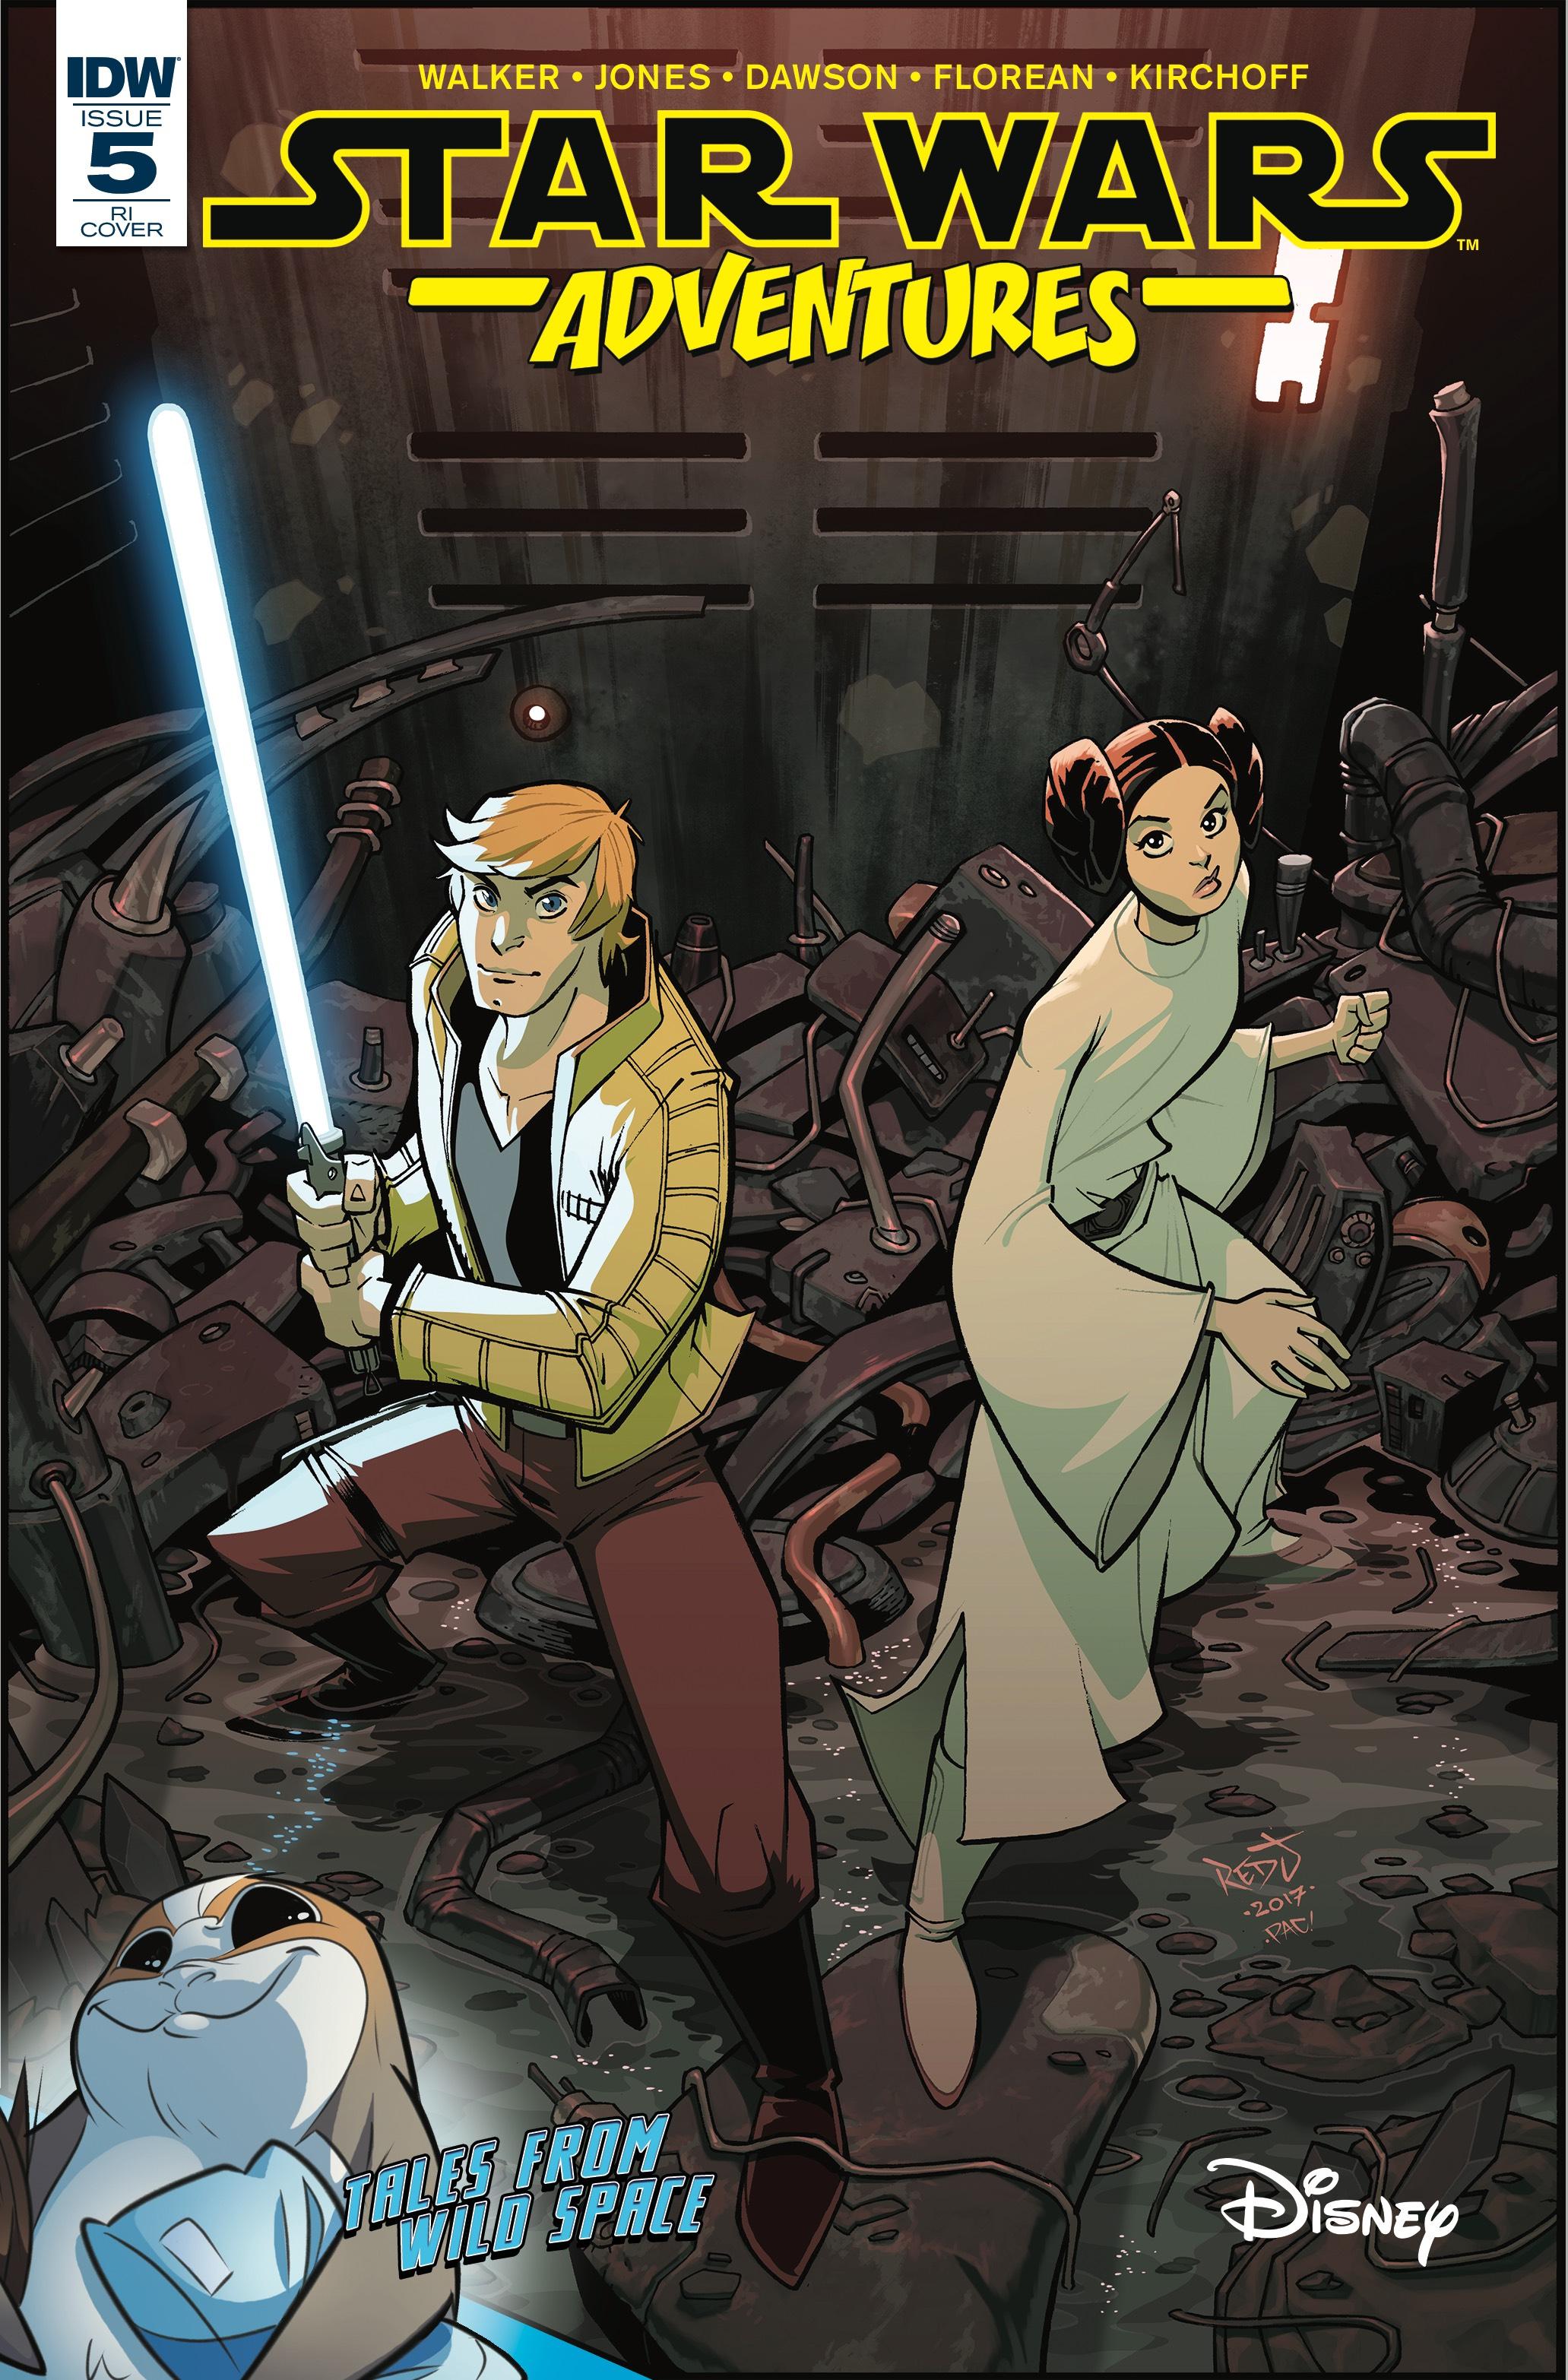 Star Wars Adventures #5 (Jon Sommariva Variant Cover) (27.12.2017)